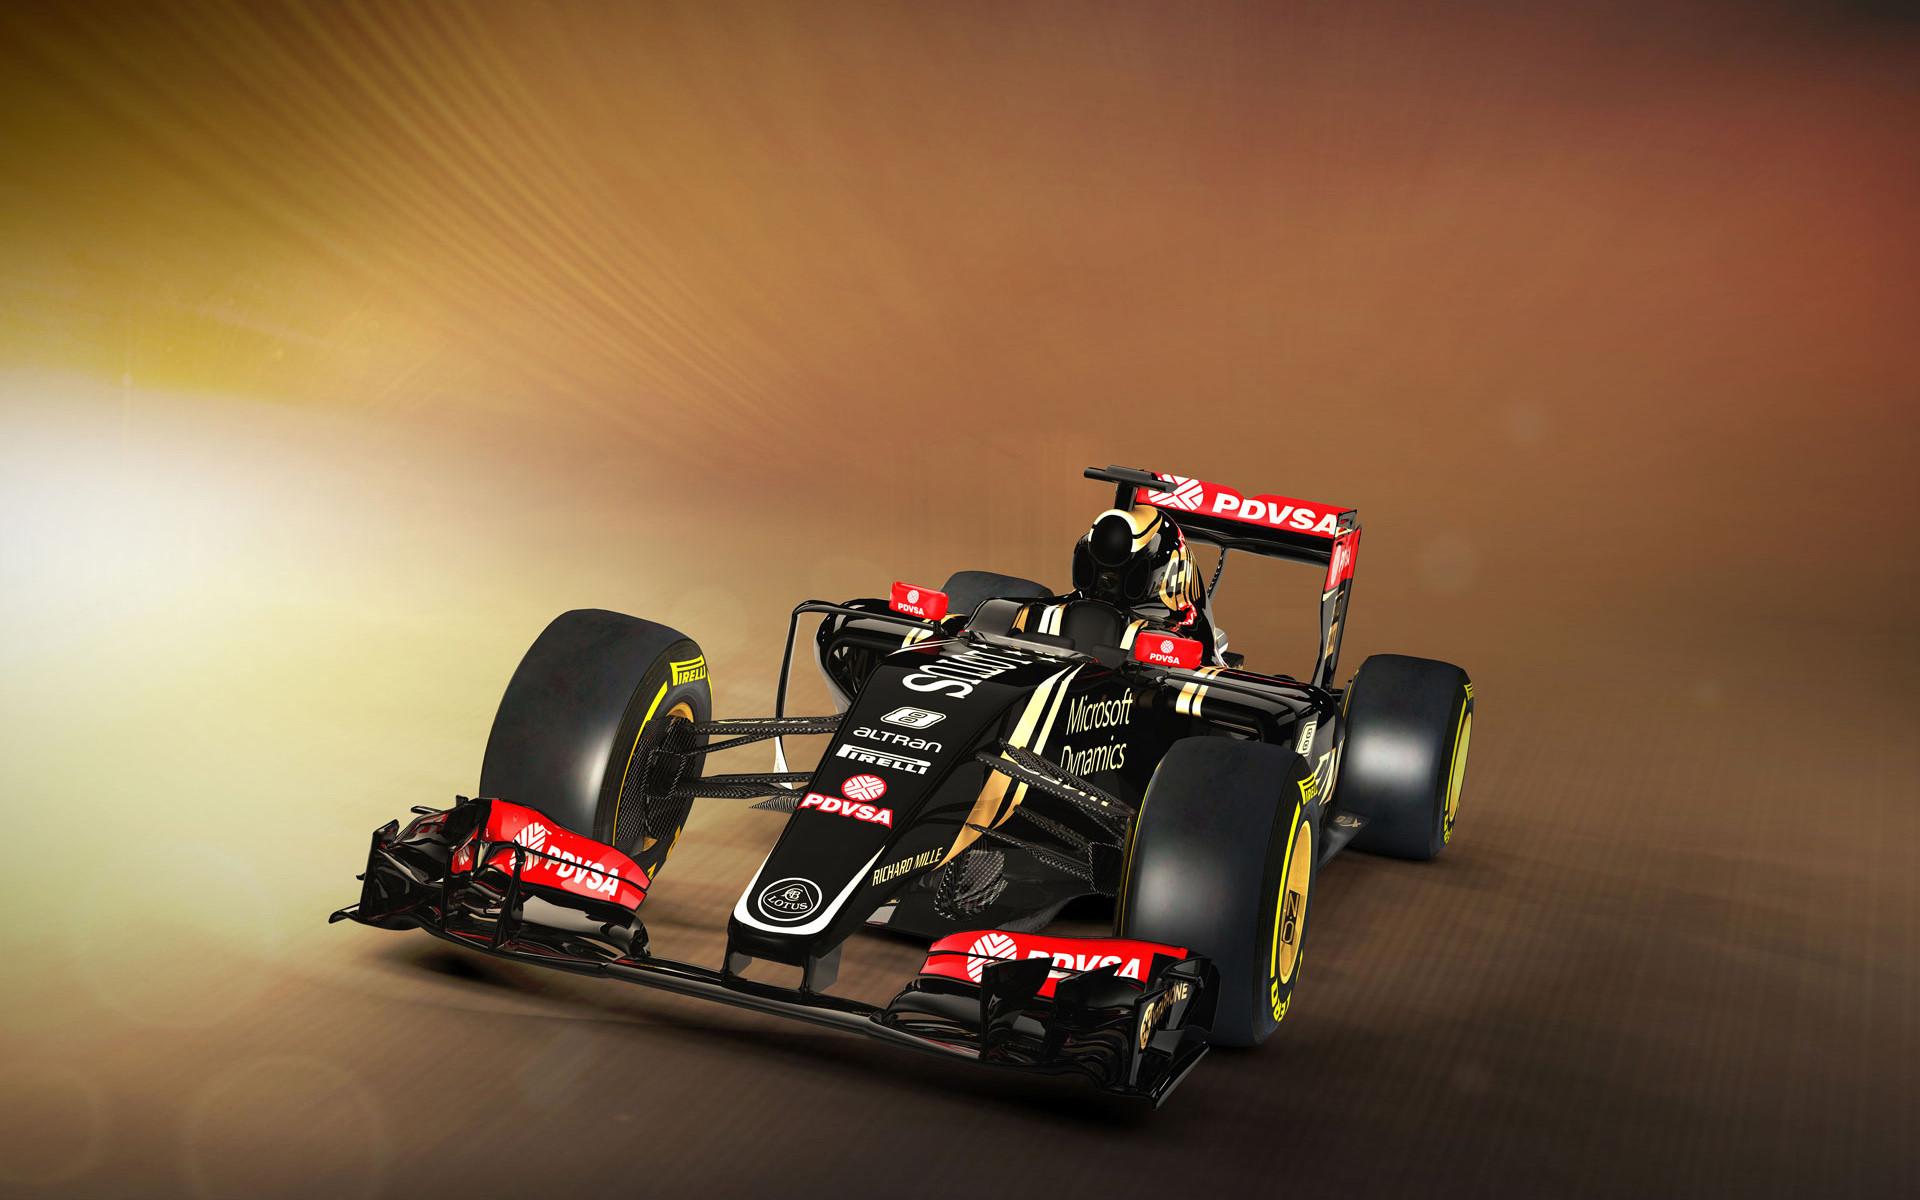 2015 Lotus E23 Formula 1